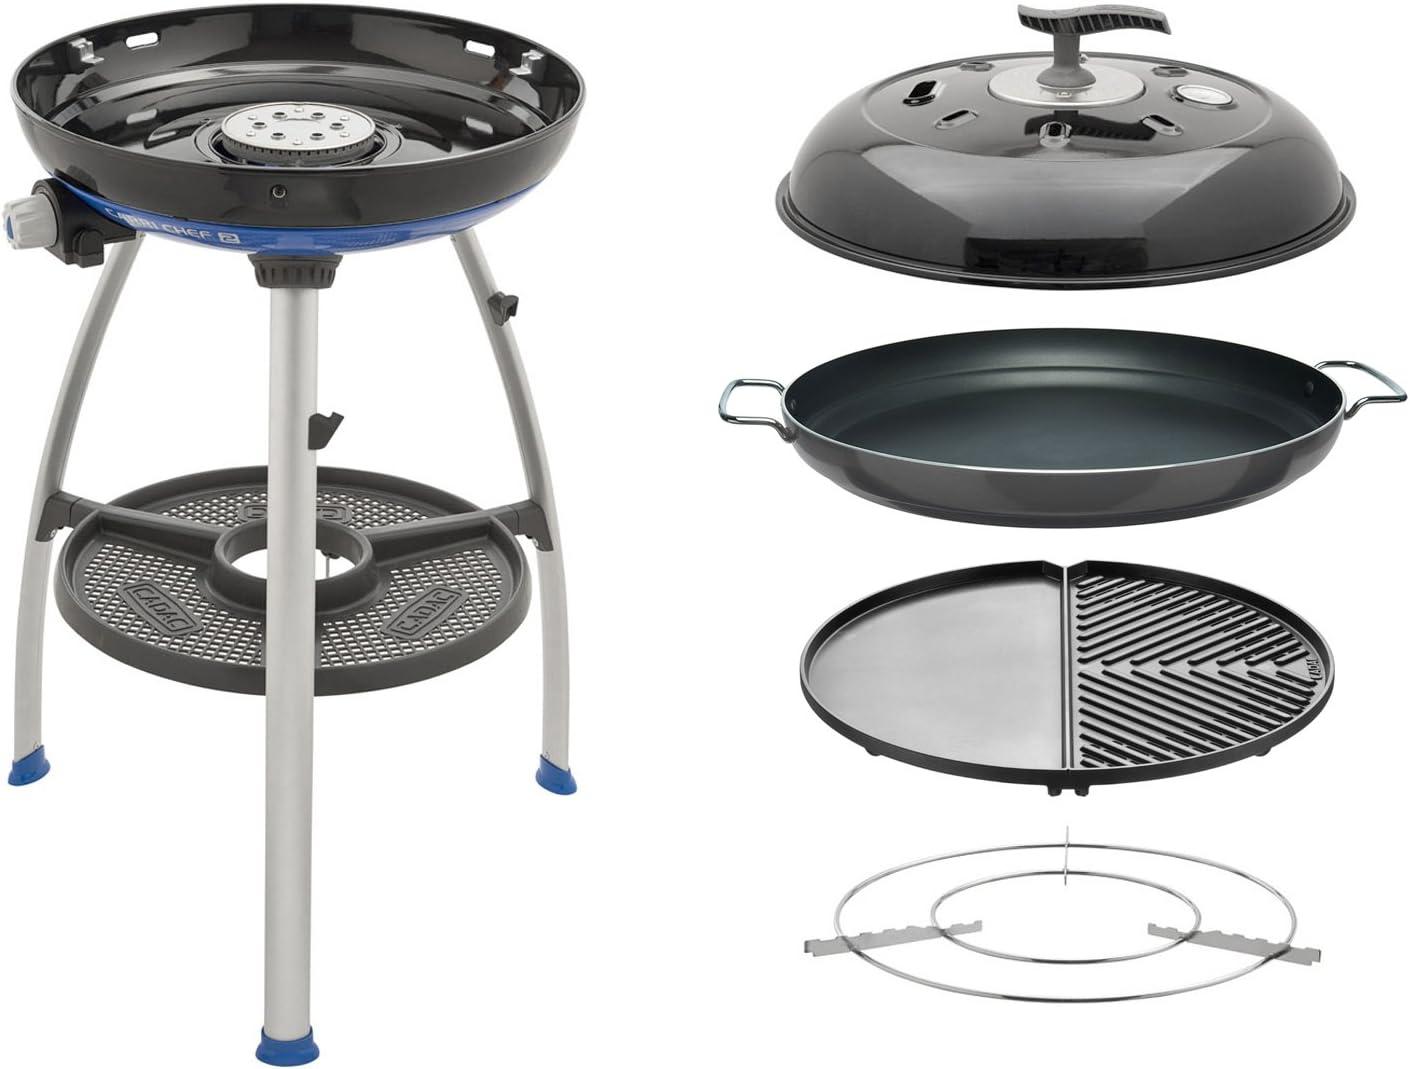 NEU Paellapfanne Camping Gasgrill Grill CADAC Carri Chef Skottel Pfanne